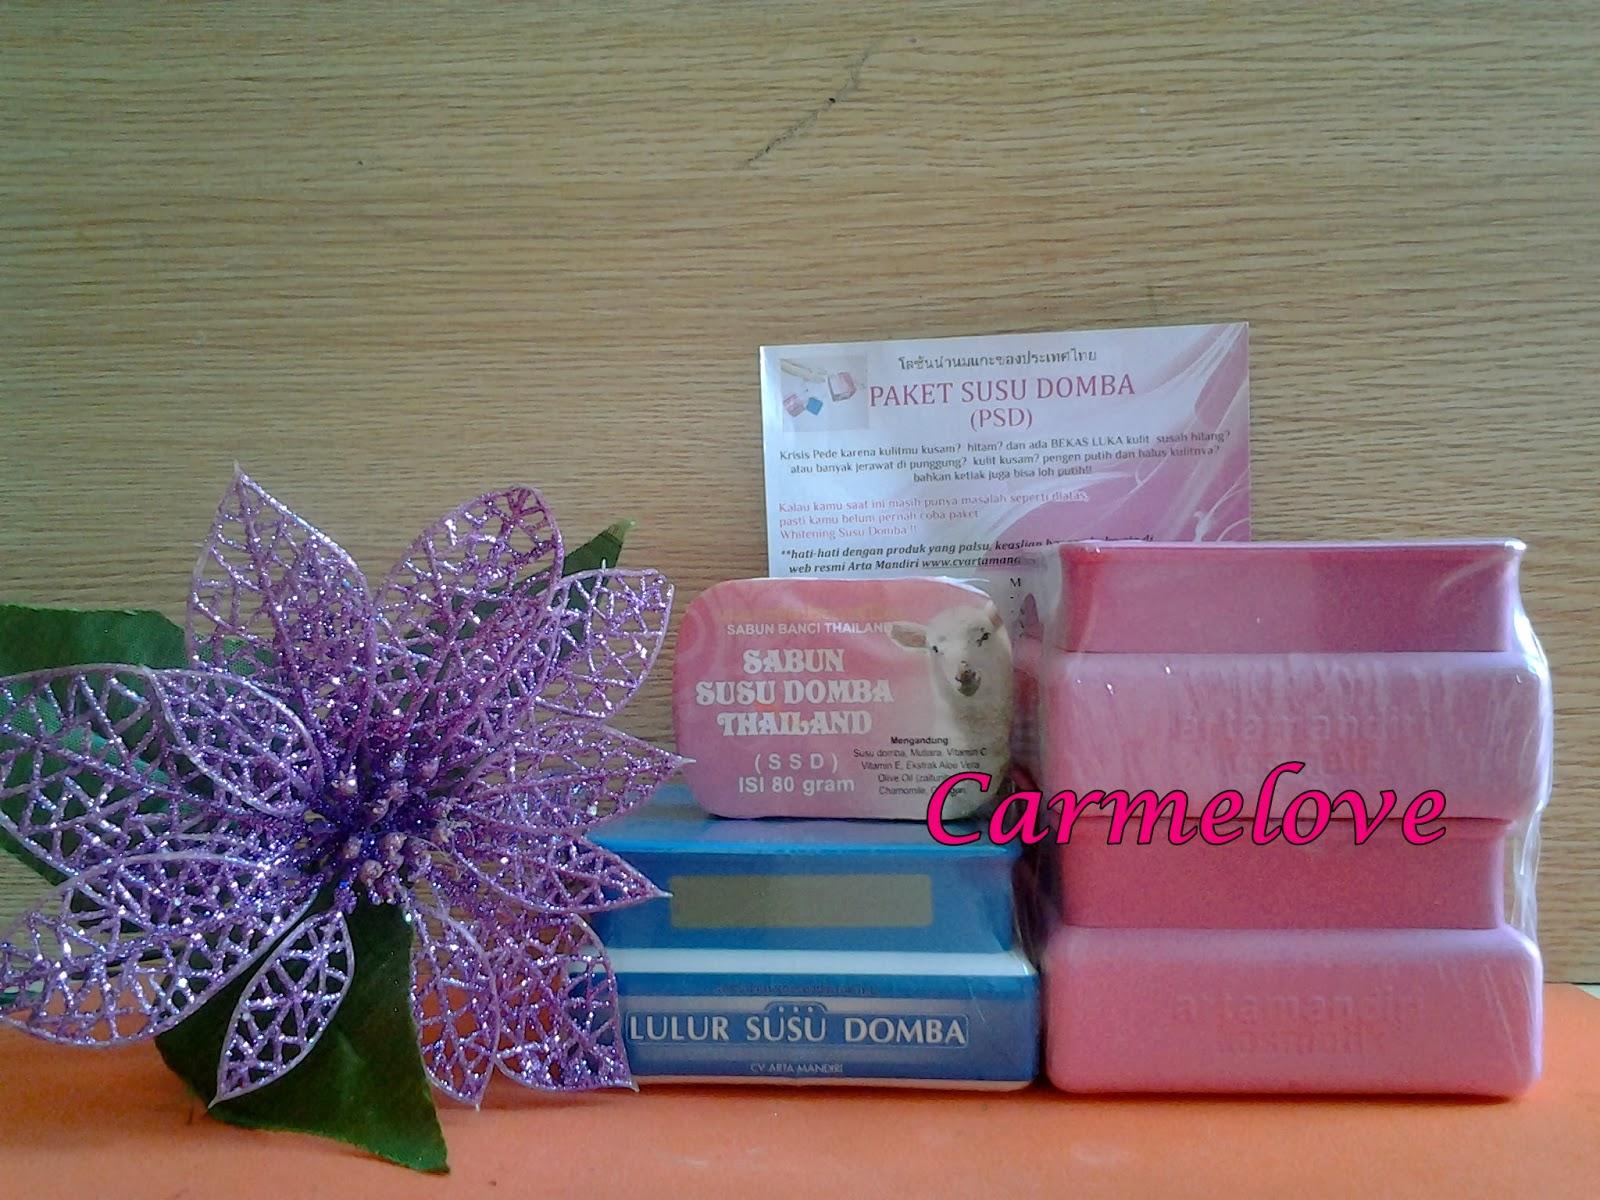 Paket Susu Domba Kemasan Kotak Psd Grosir Kosmetik Murah Cream